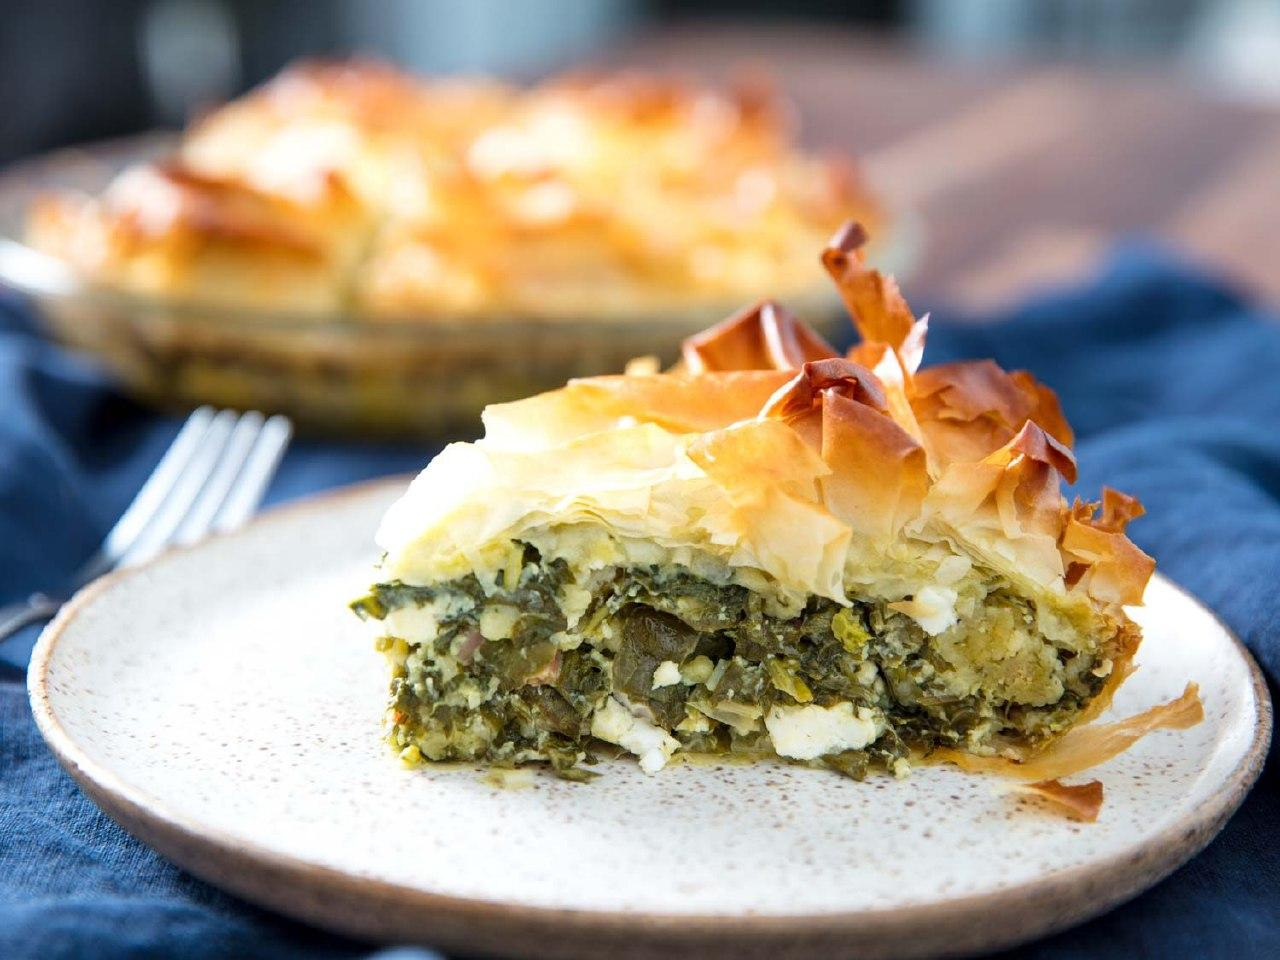 Греческий пирог спанакопита - рецепт от Кулинар Мастер